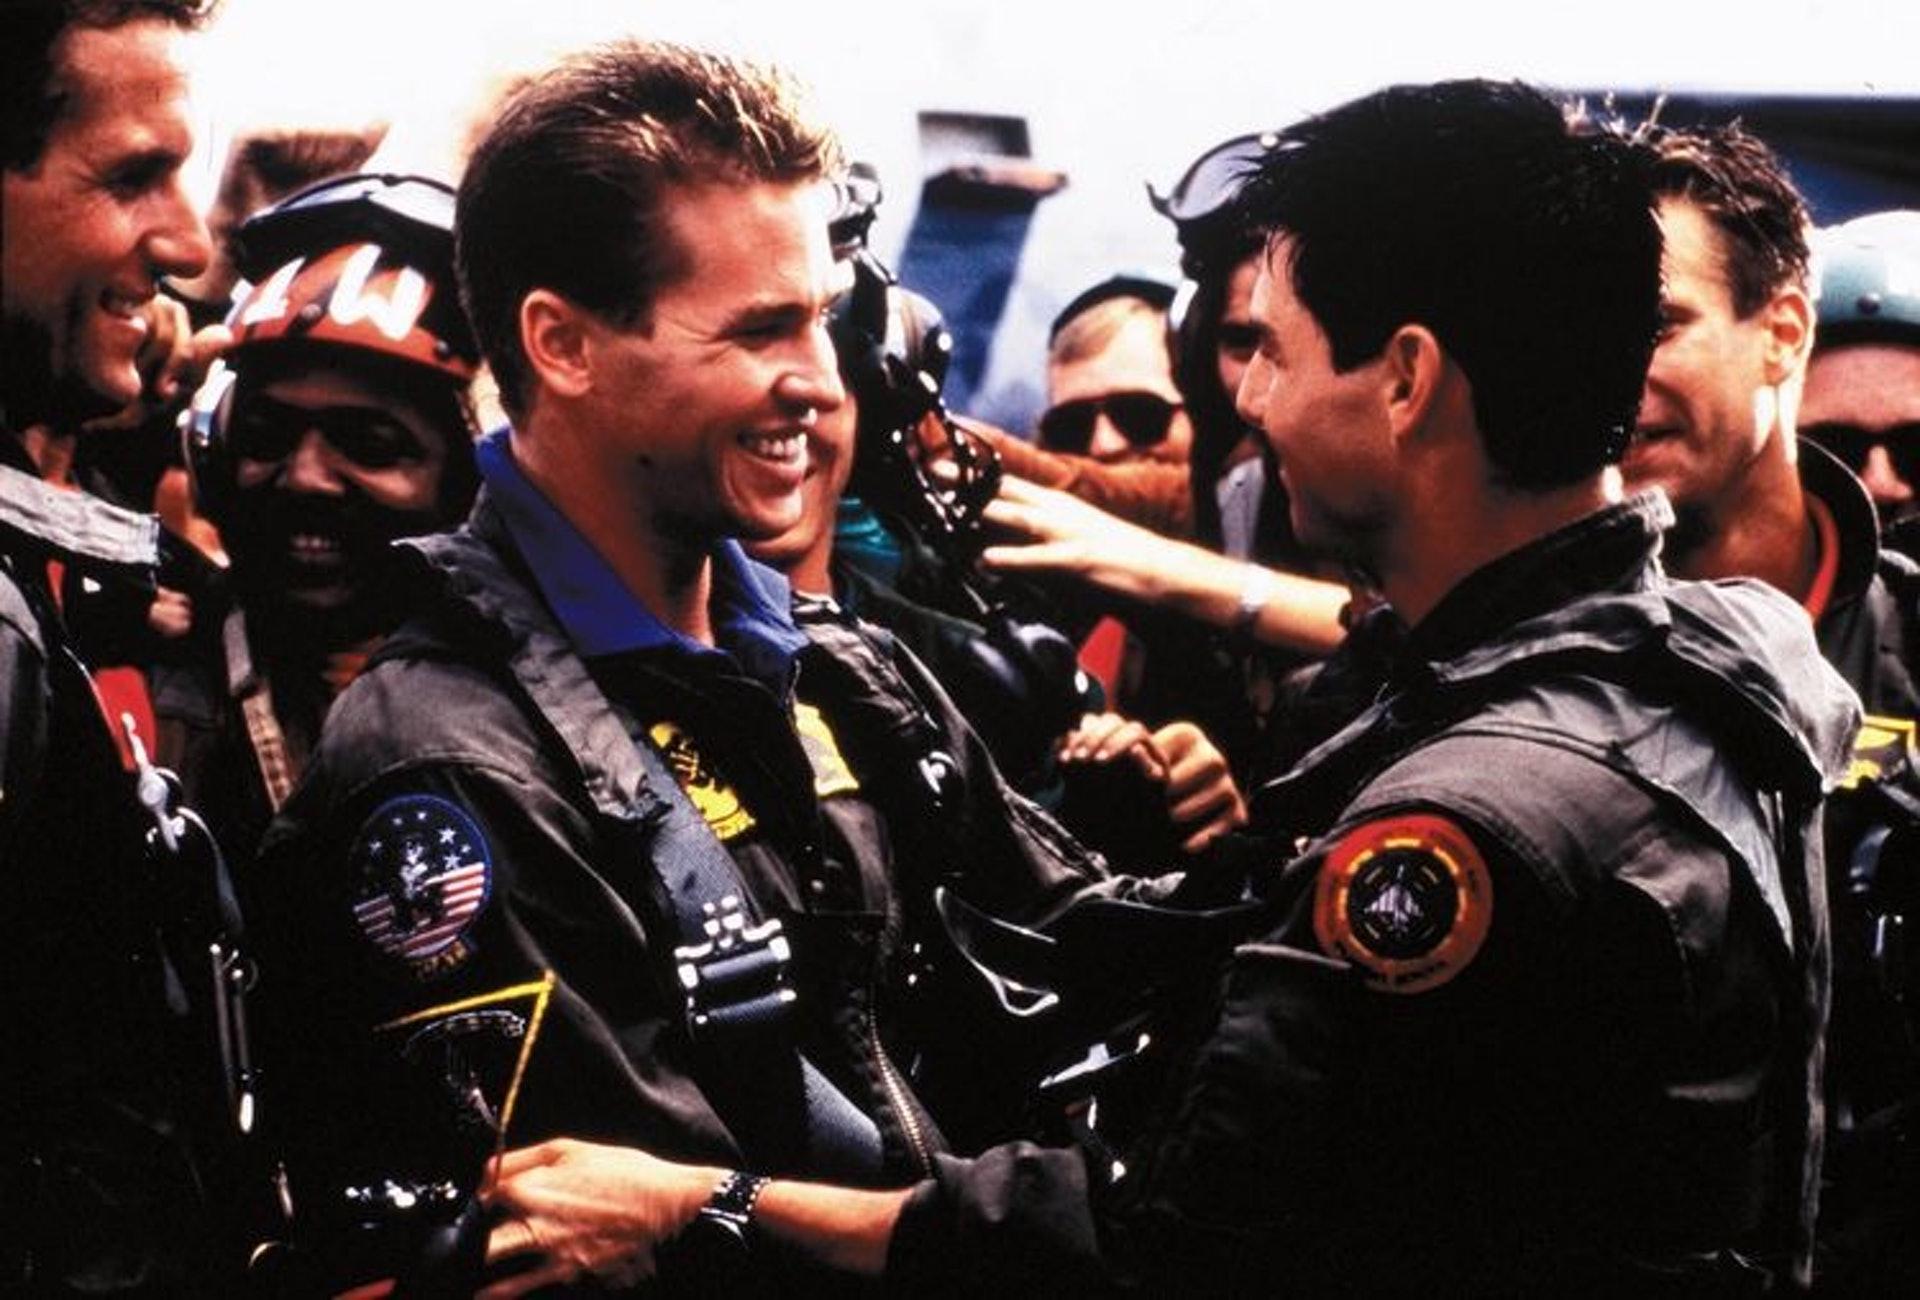 Maverick及Iceman亦將續拍《壯志凌雲2》。(網上圖片)